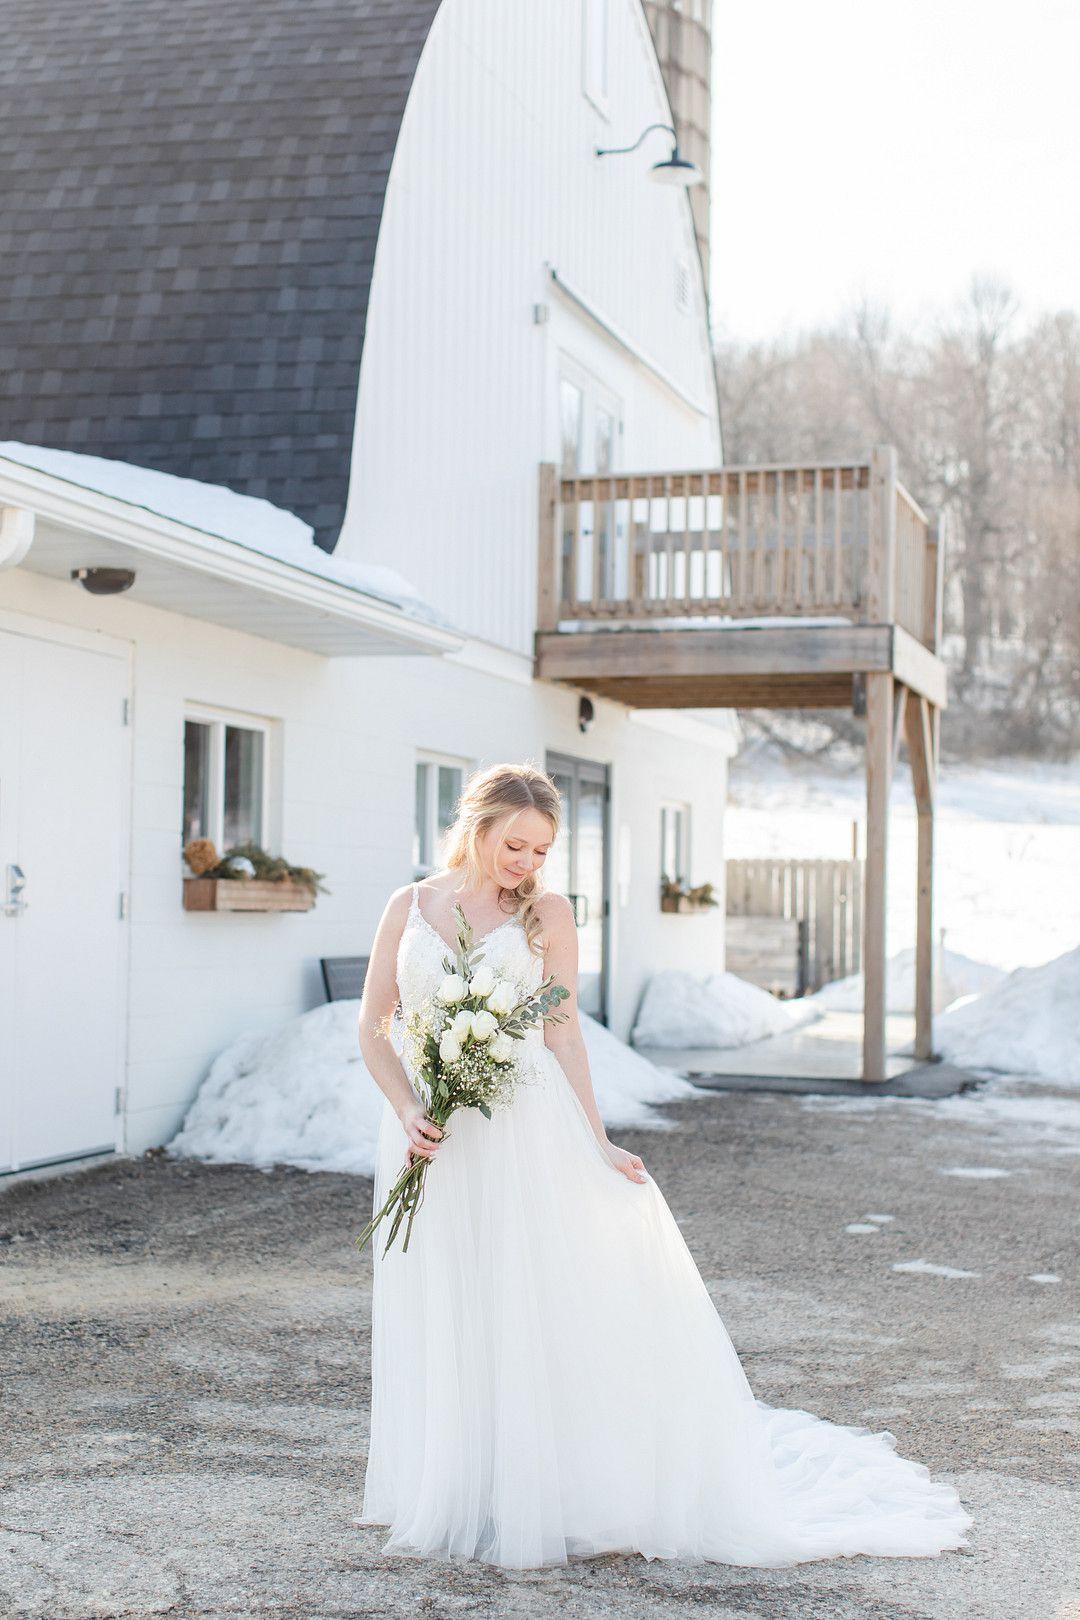 bride in wedding dress in front of barn